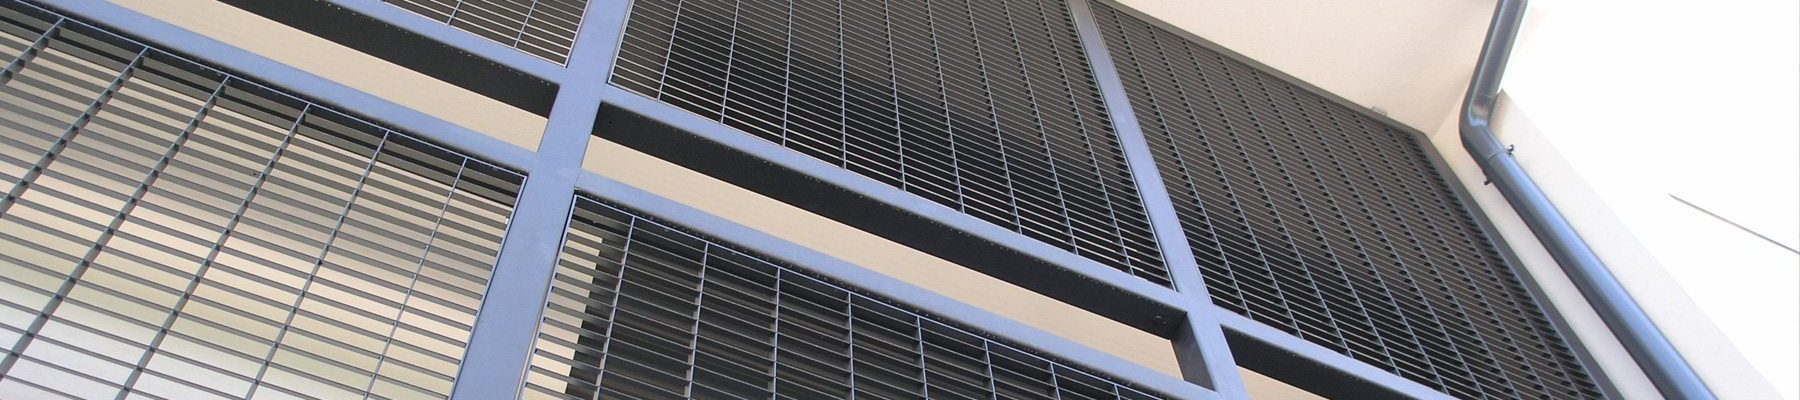 Banner-DeltaBox-70-steel-louvre-balustrade-screen-2